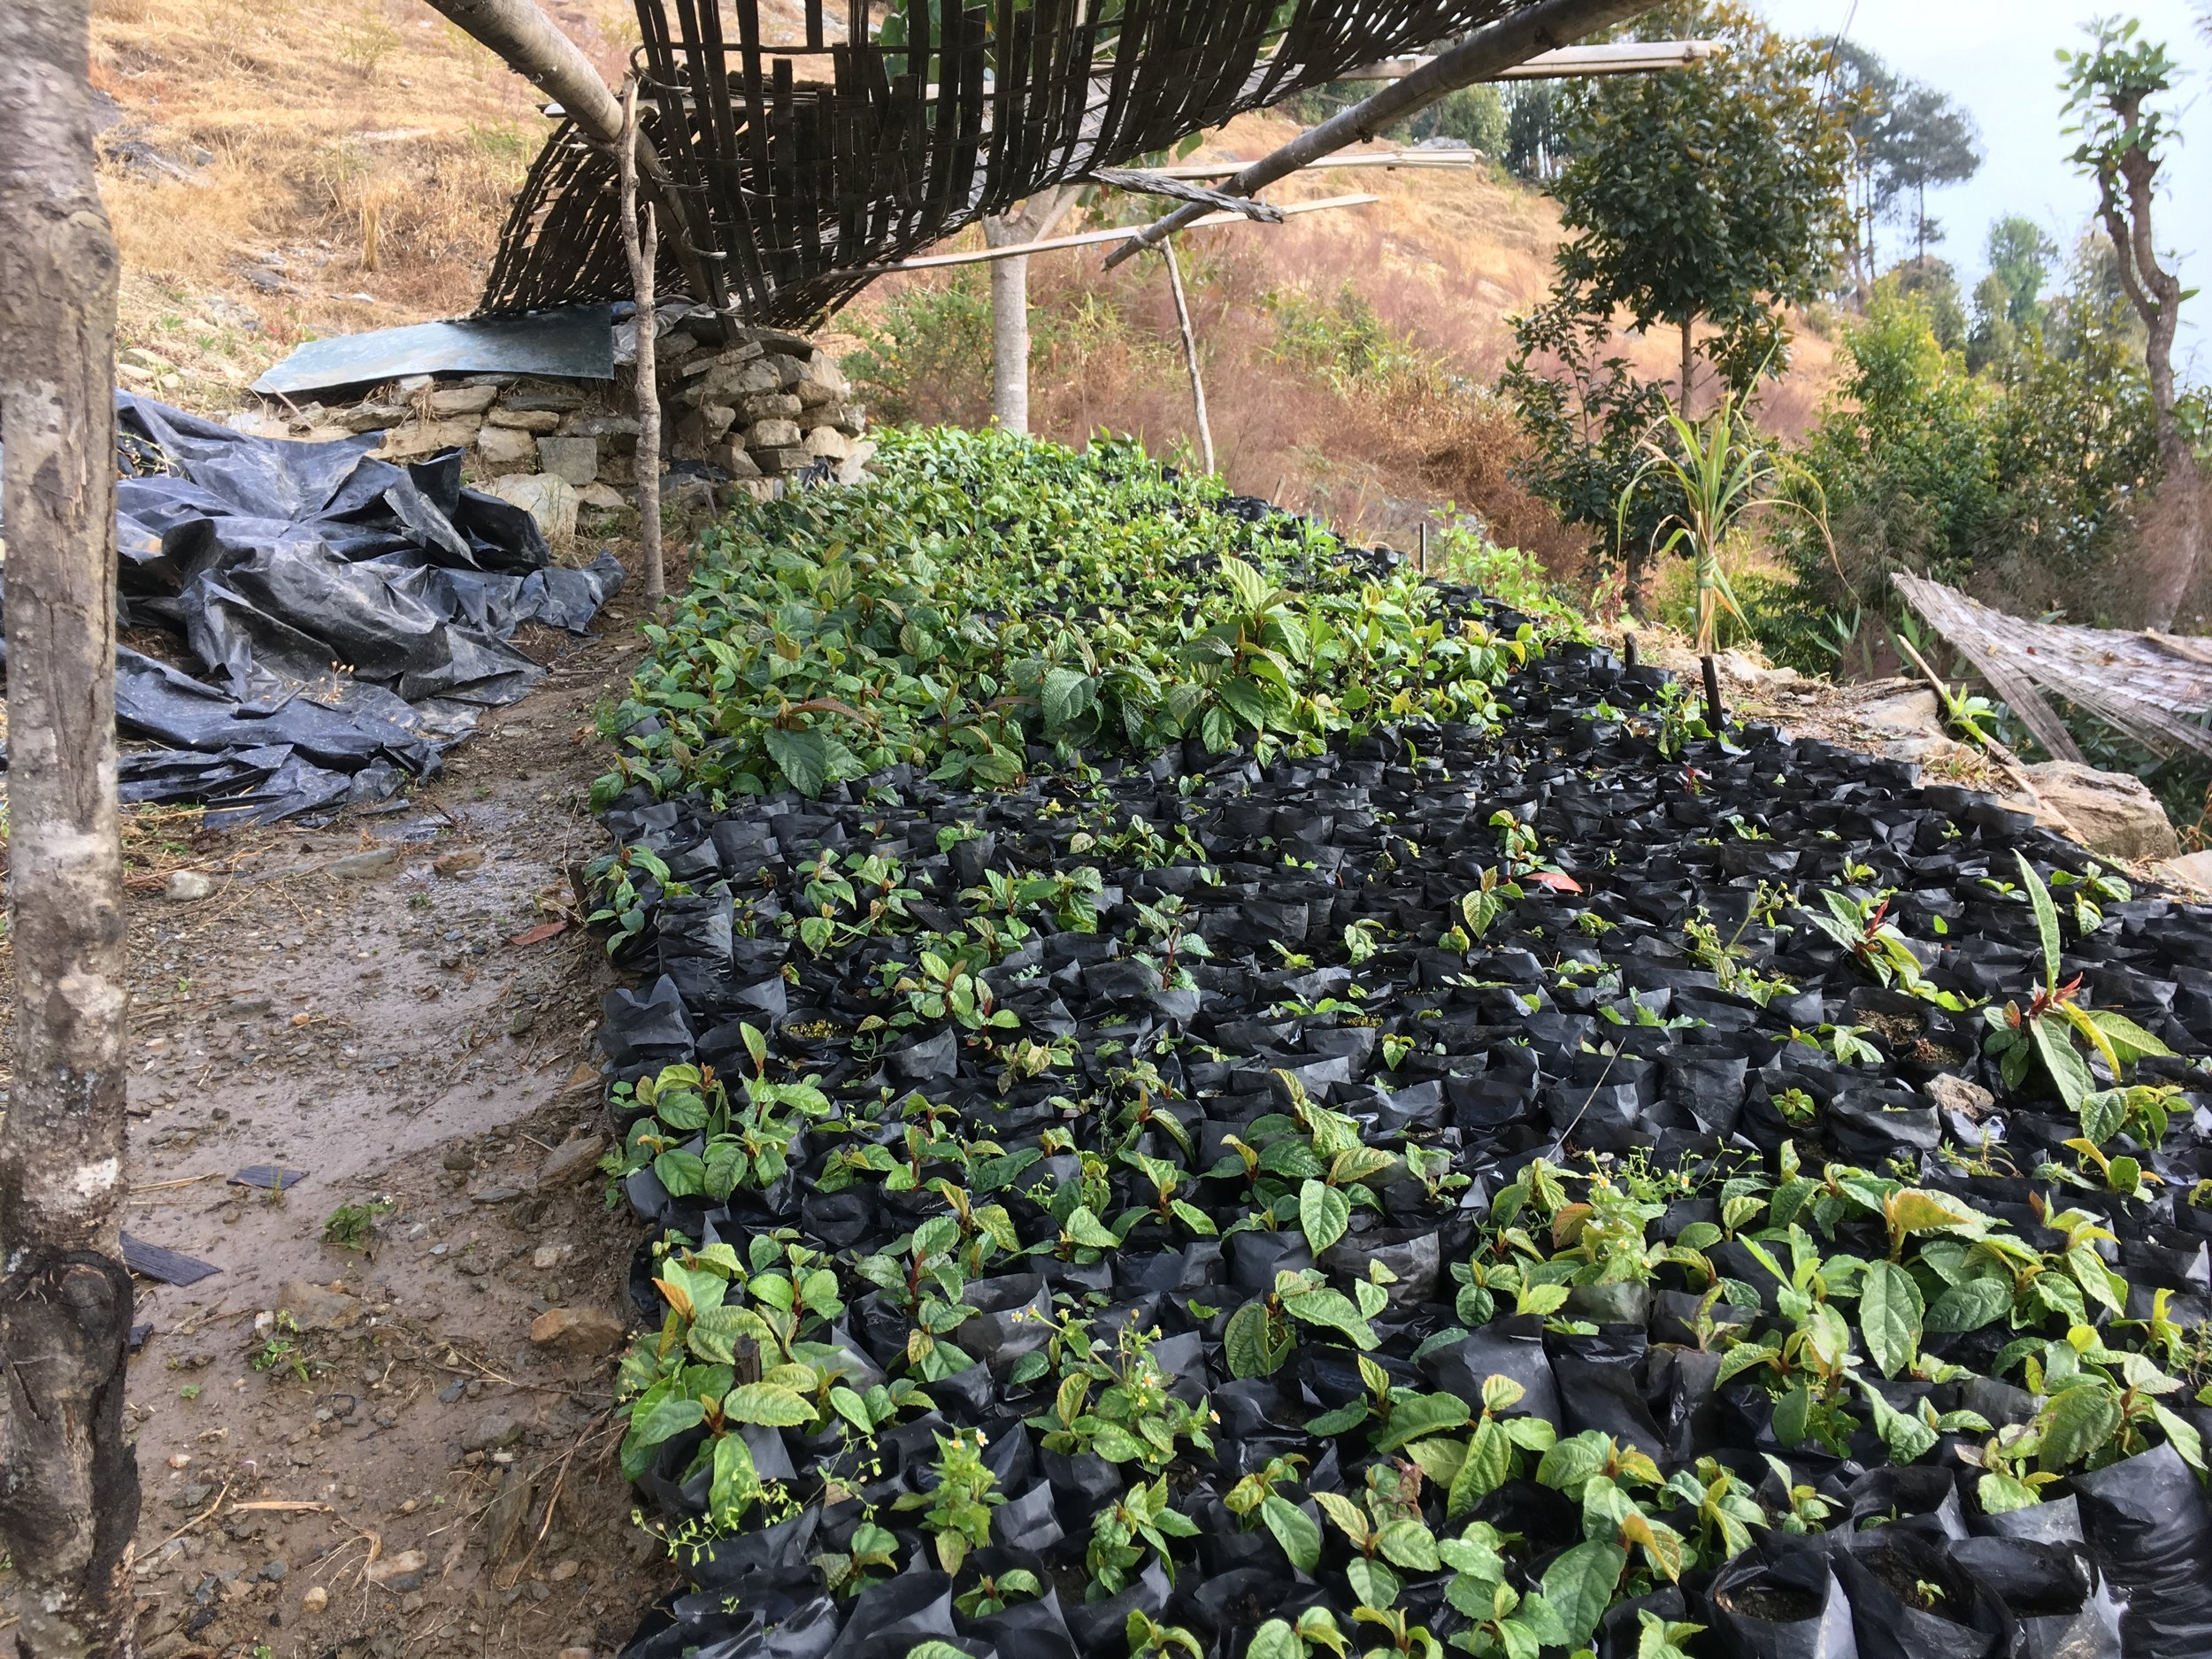 Seedlings grow at Deusa AFRC demonstration nursery. (February 2017)